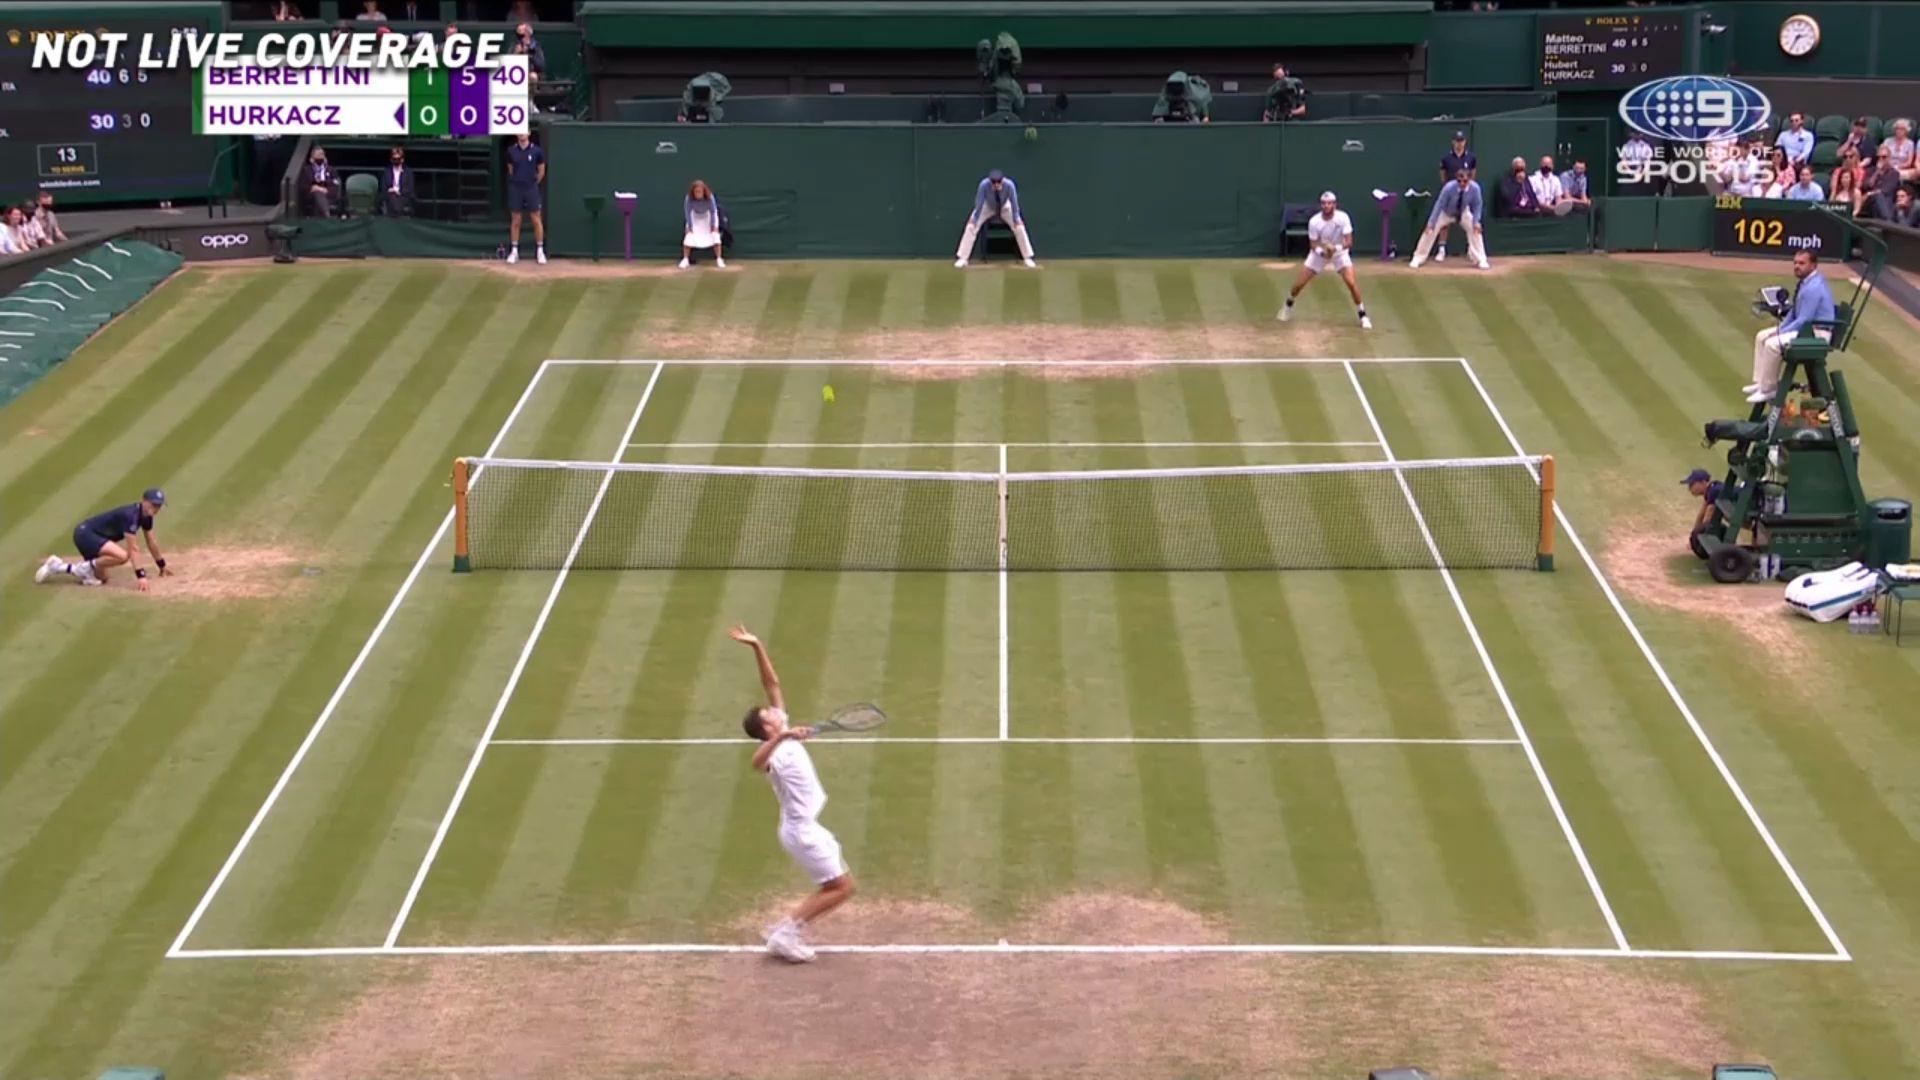 Matteo Berrettini beats Hubert Hurkacz to become first Italian player to reach a Wimbledon final